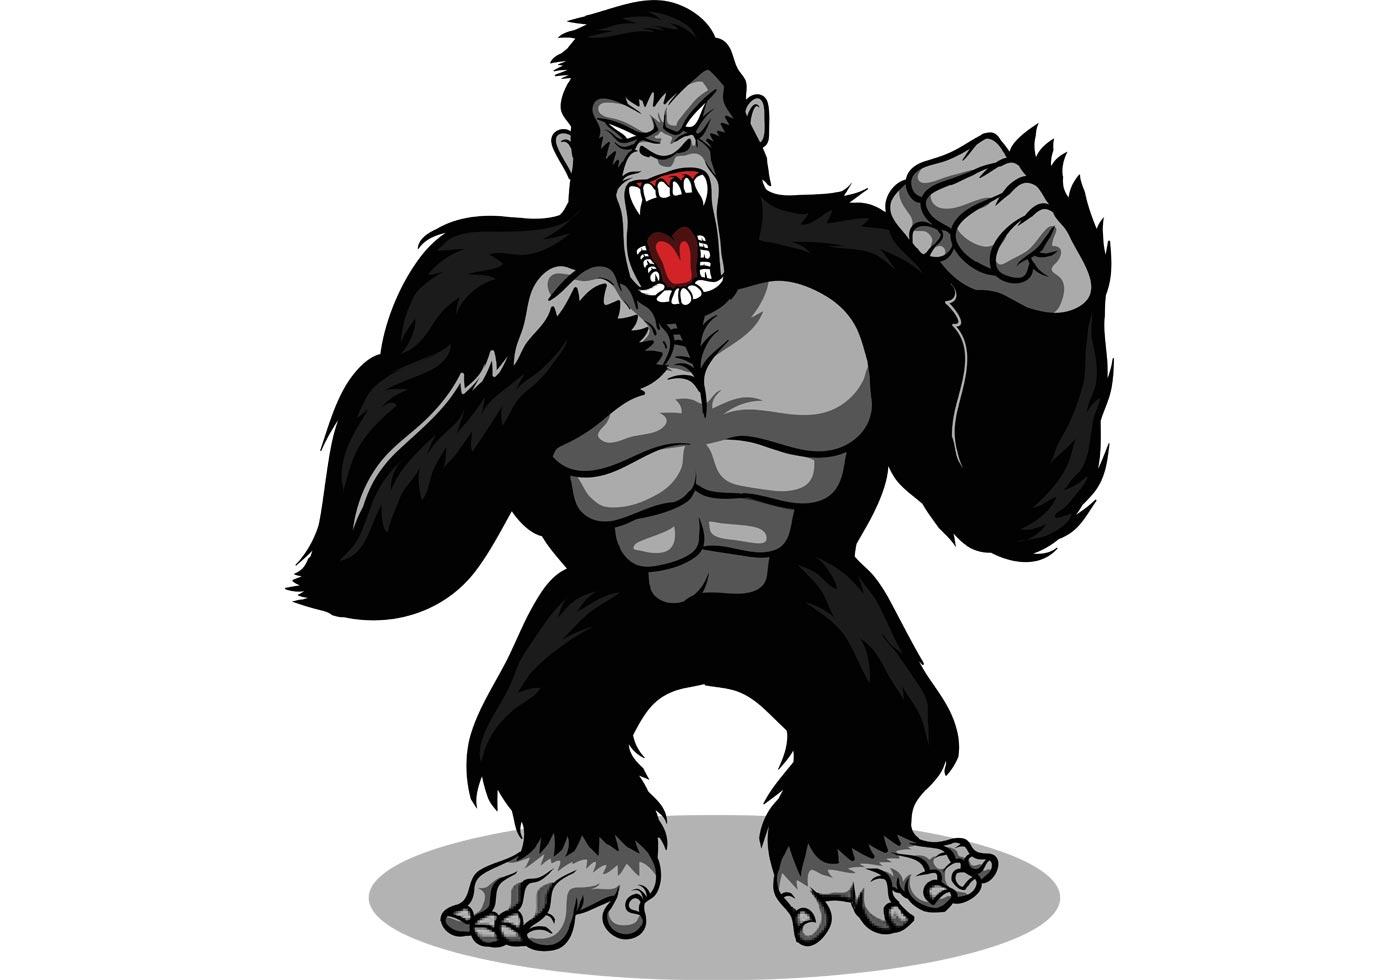 Gorilla Vector - Download Free Vector Art, Stock Graphics ... - photo#19